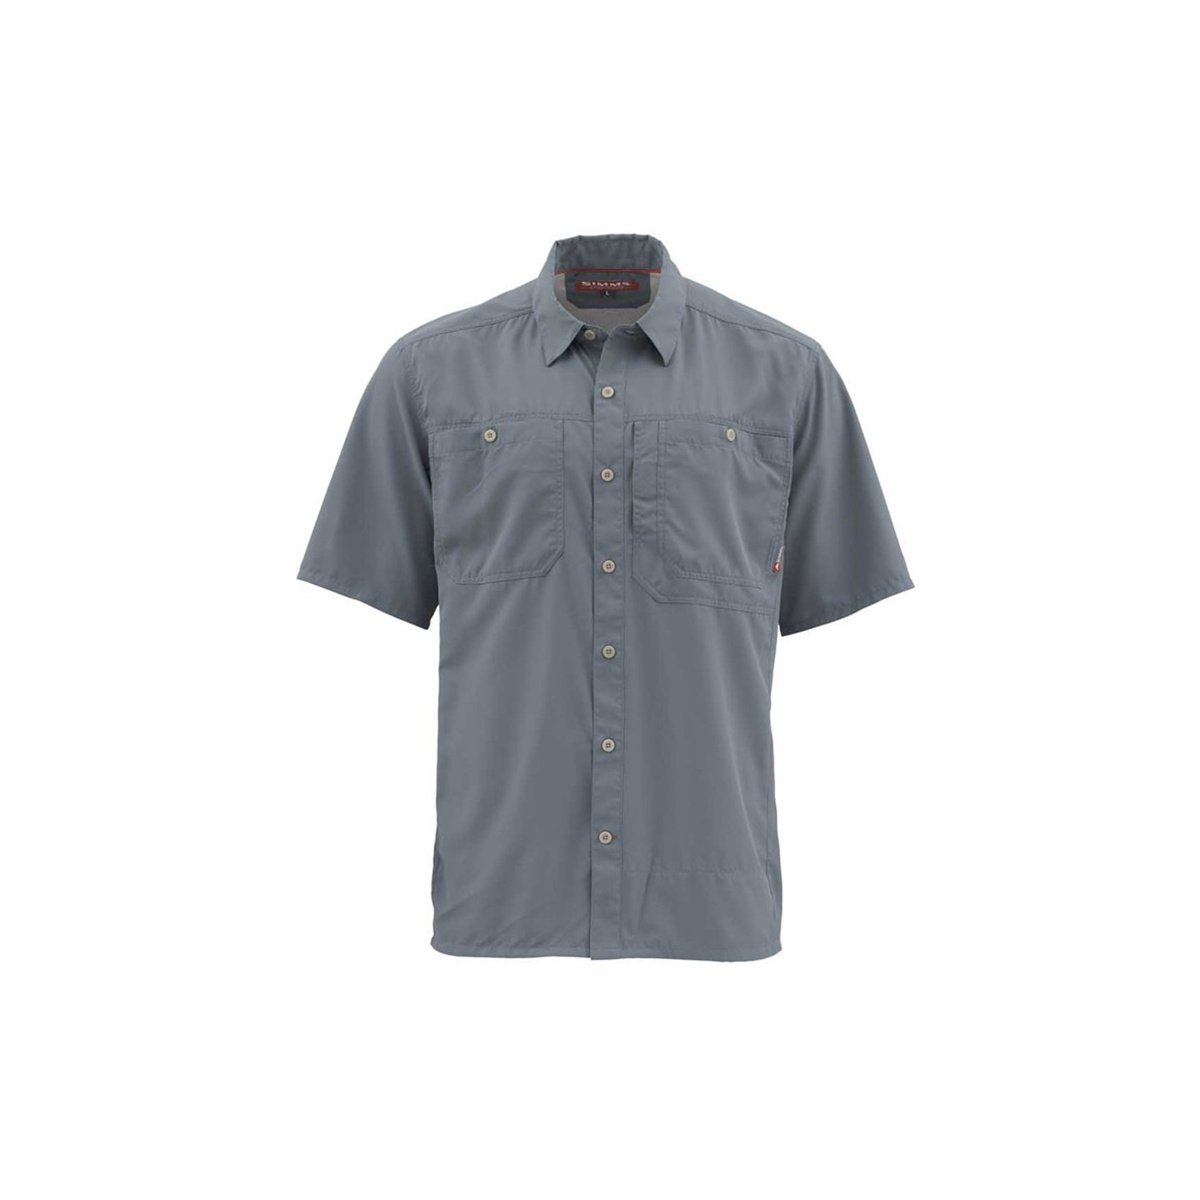 Simms Clothing Ebbtide Short Sleeve Shirt